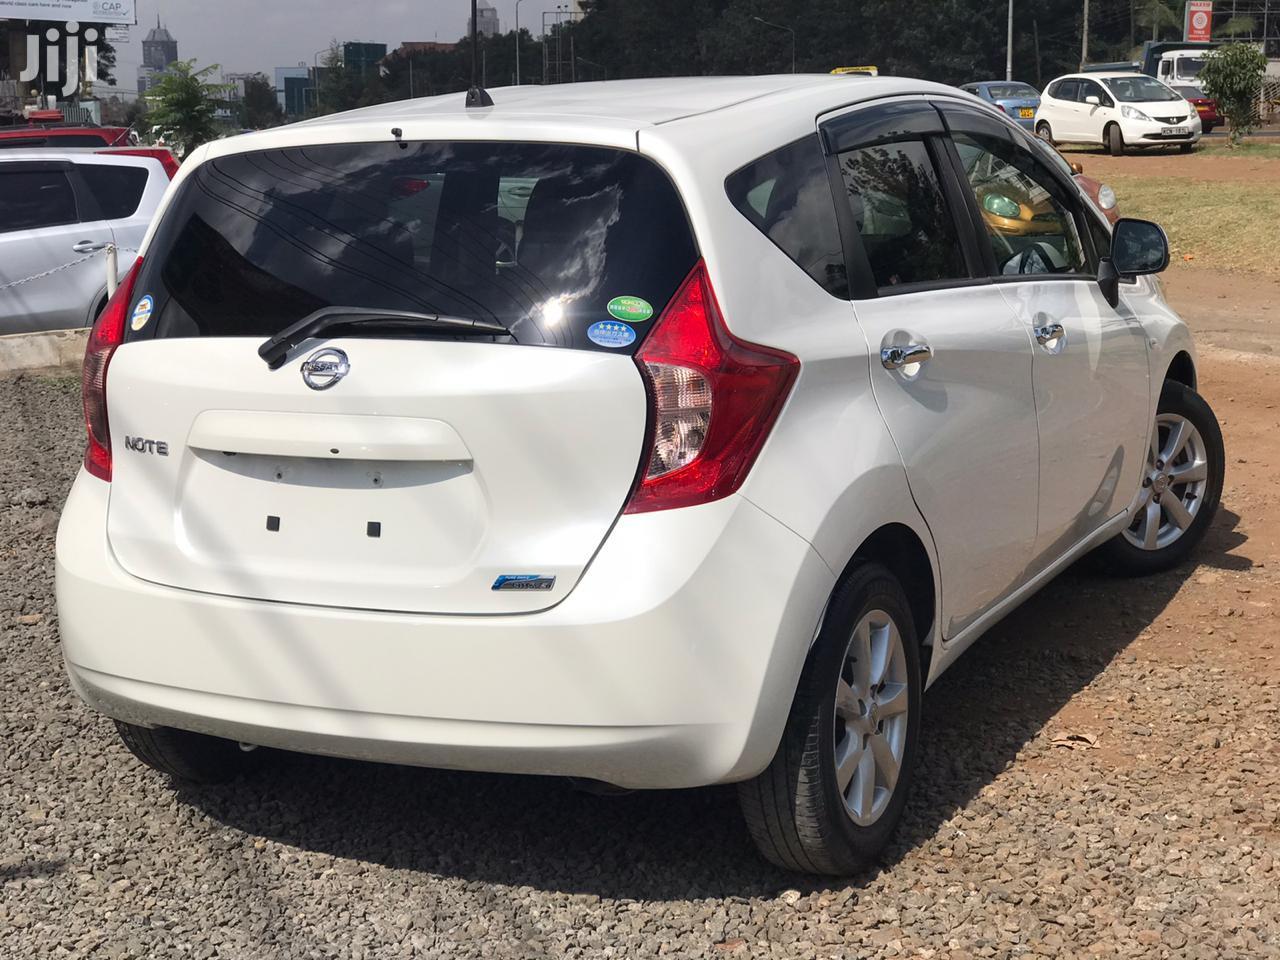 Nissan Note 2012 1.4 White | Cars for sale in Nairobi Central, Nairobi, Kenya